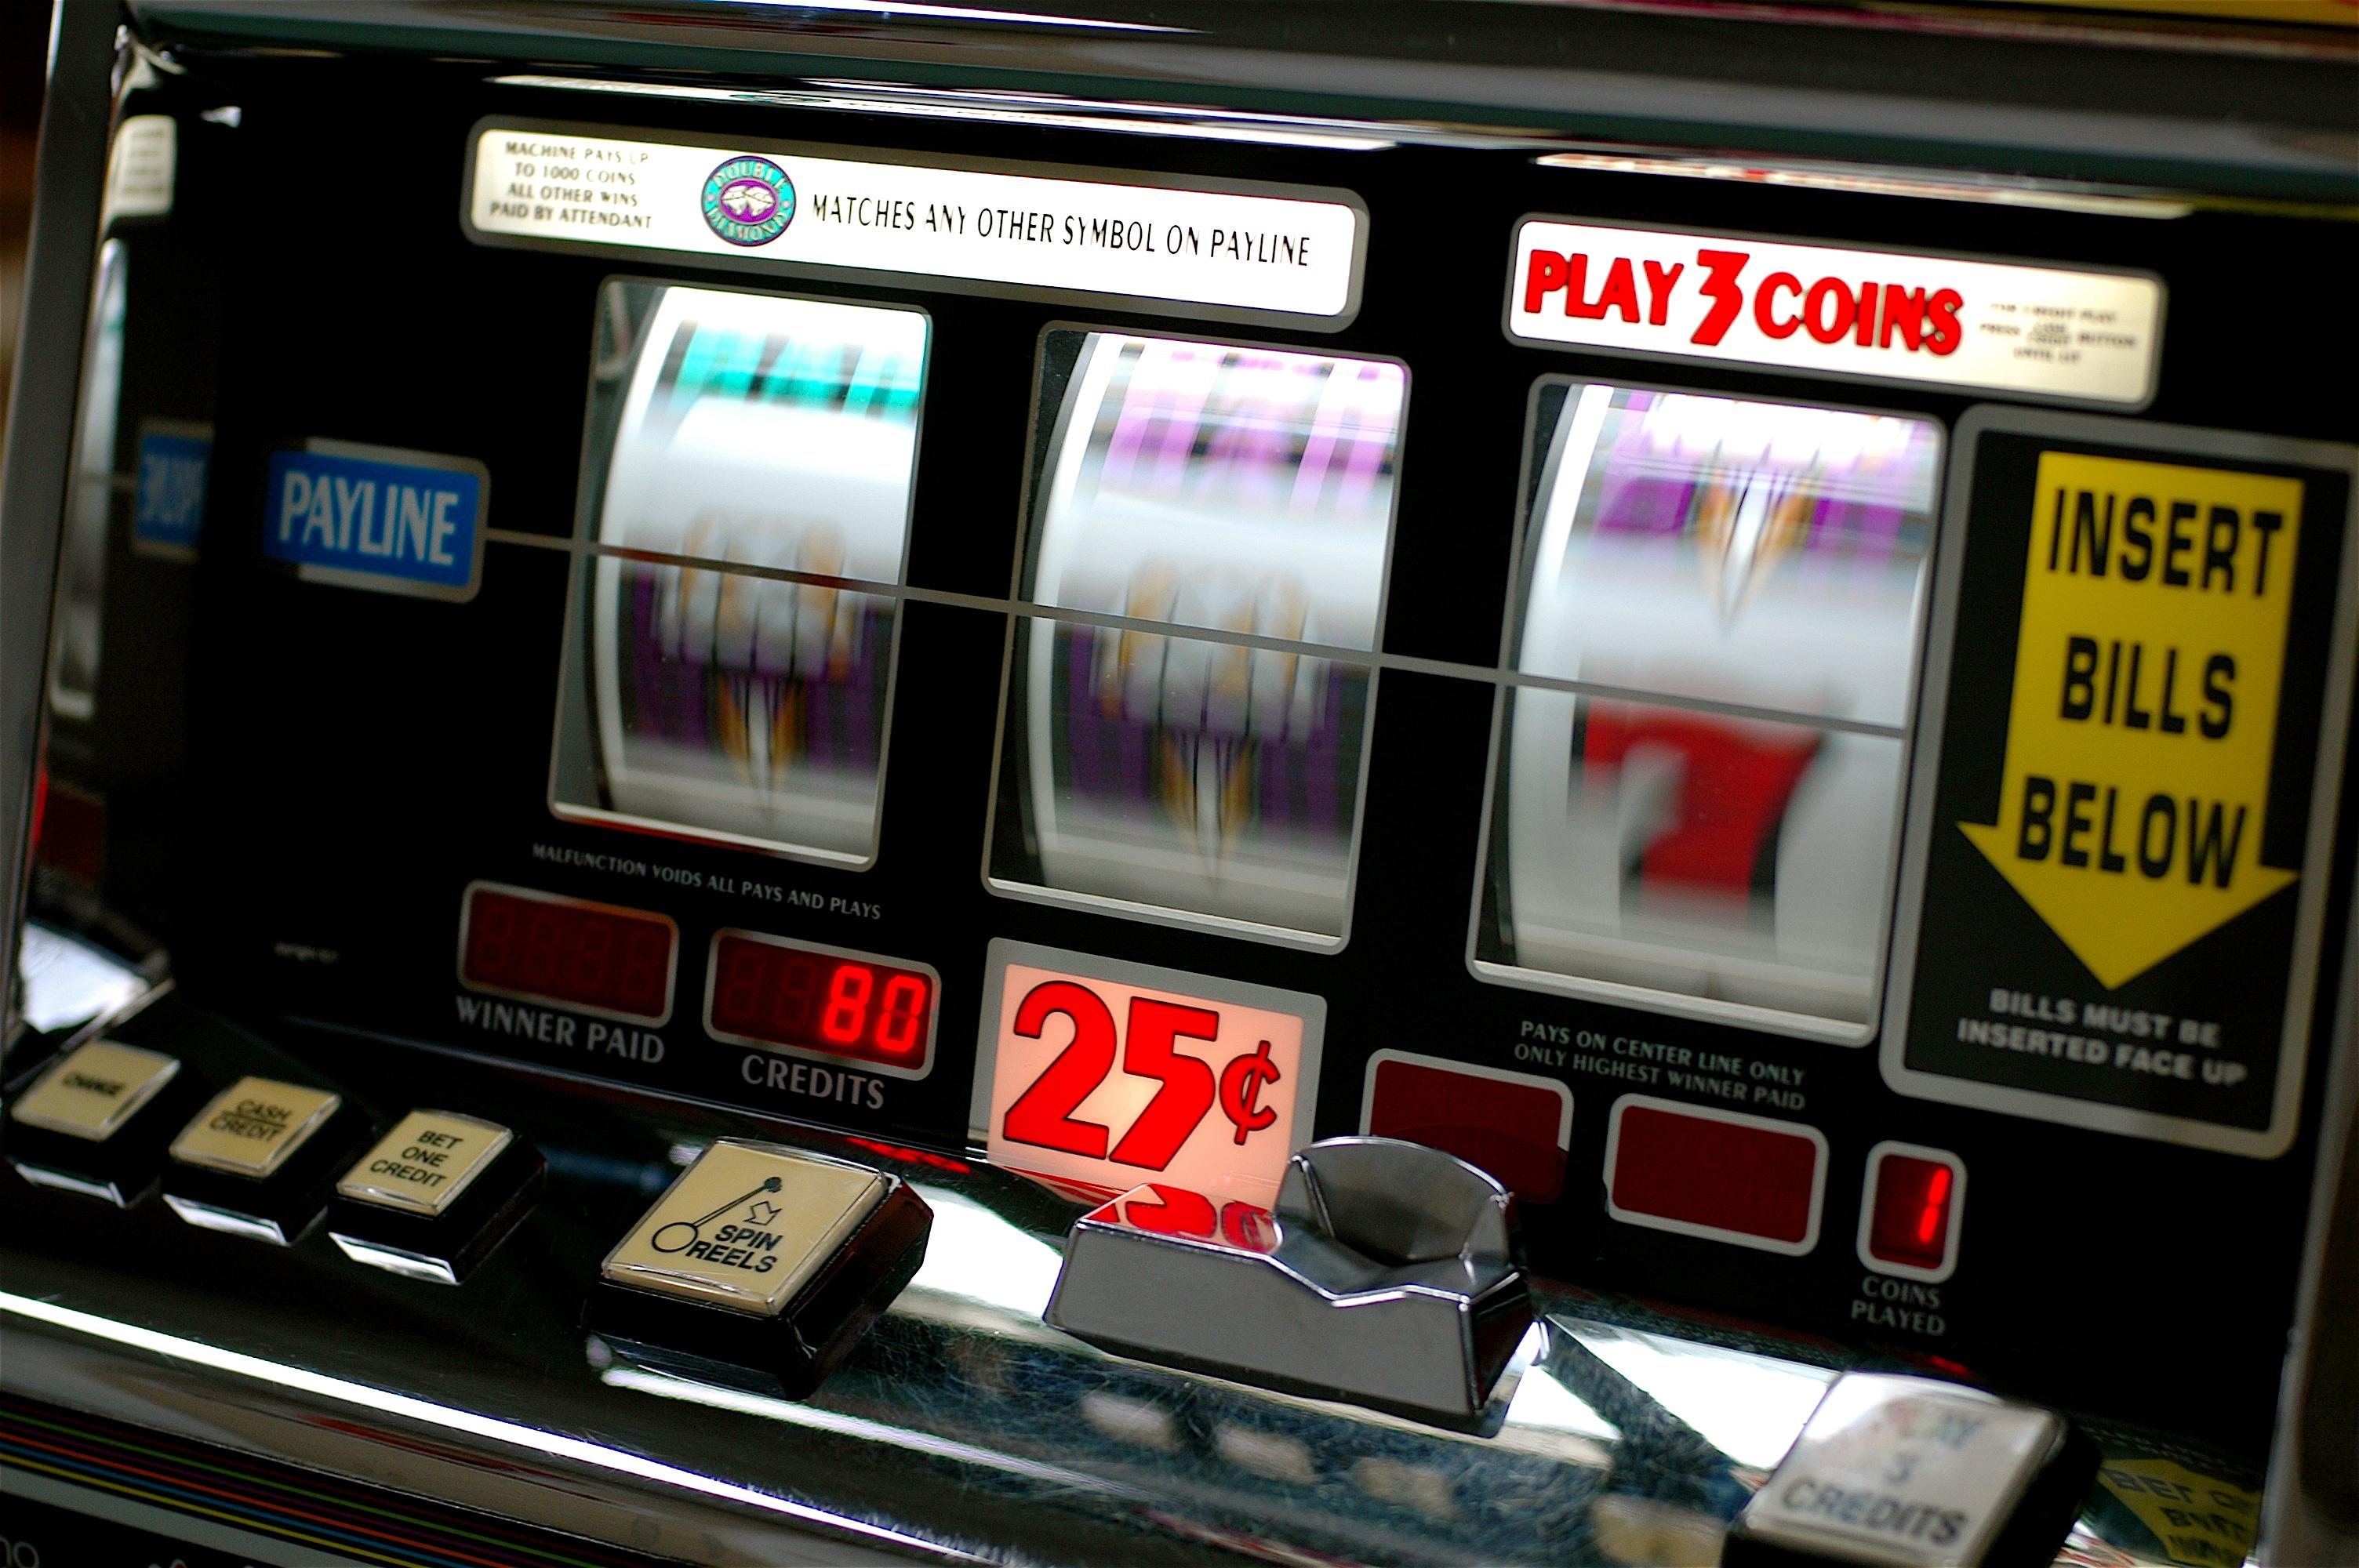 soaring eagle casino online slots